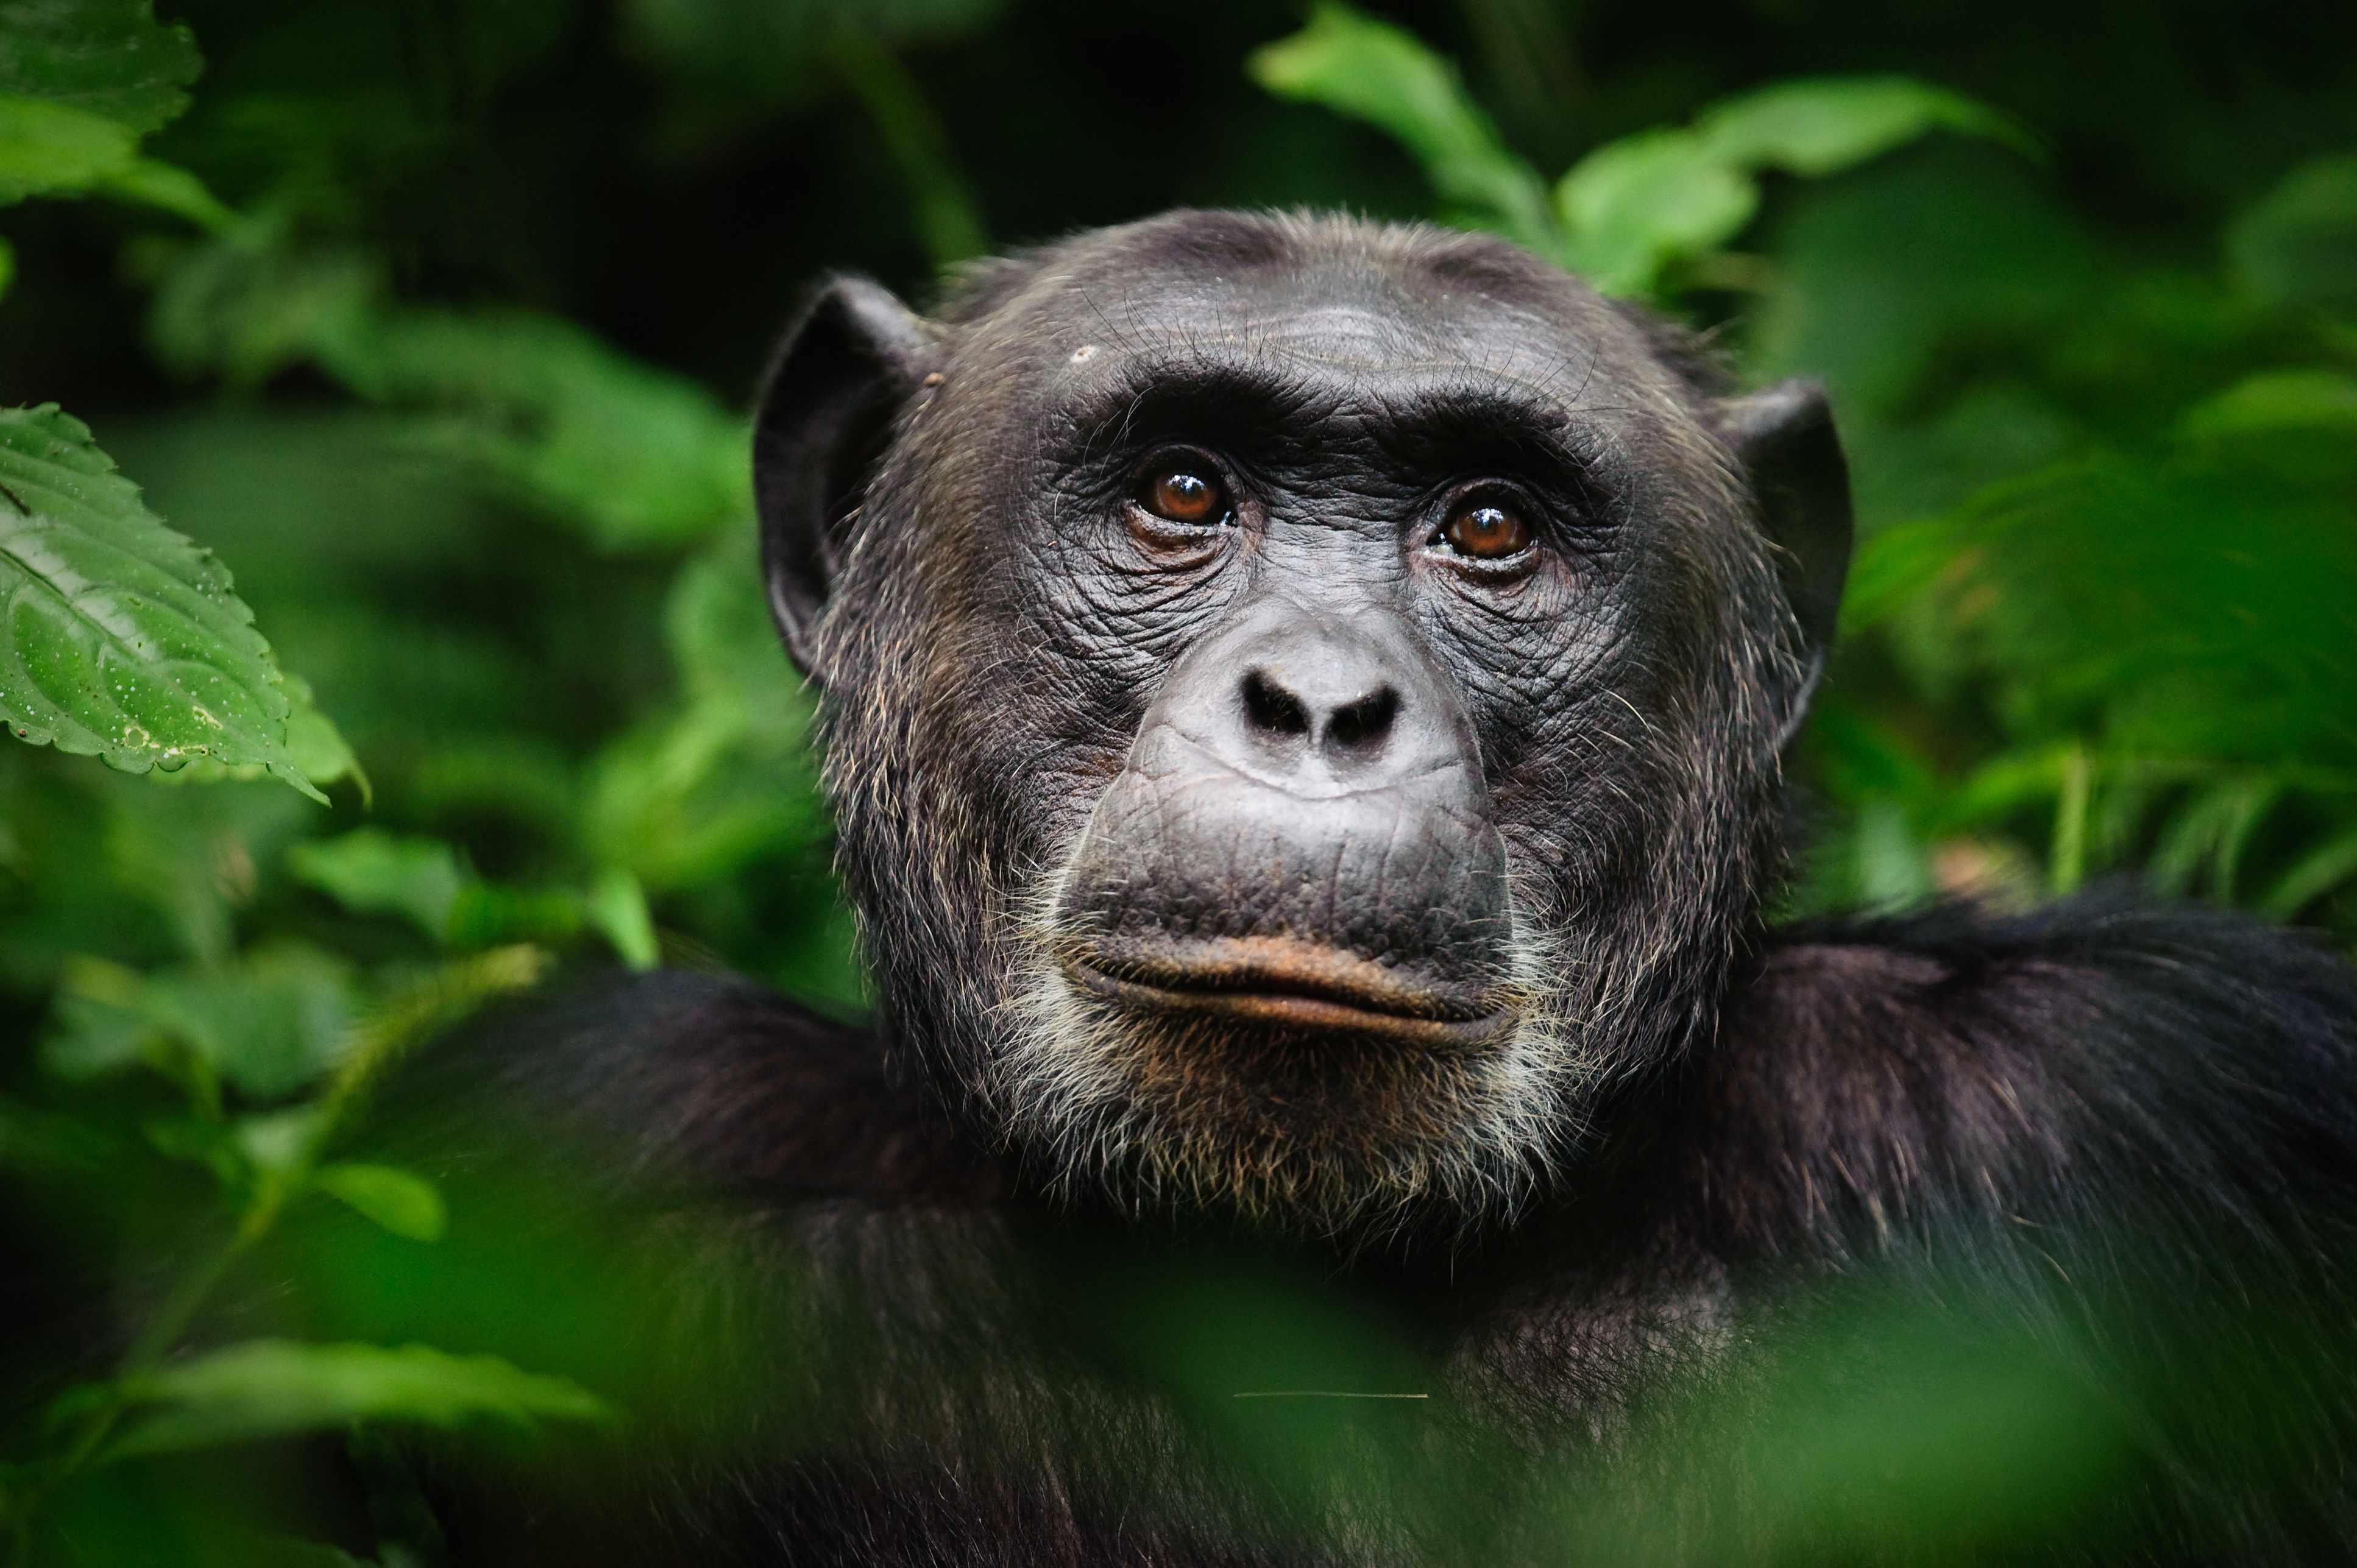 An extreme closeup portrait of the alpha male chimpanzee (Pan troglodytes), Kibale Forest National Park, Uganda. © Marc Guitard/Getty